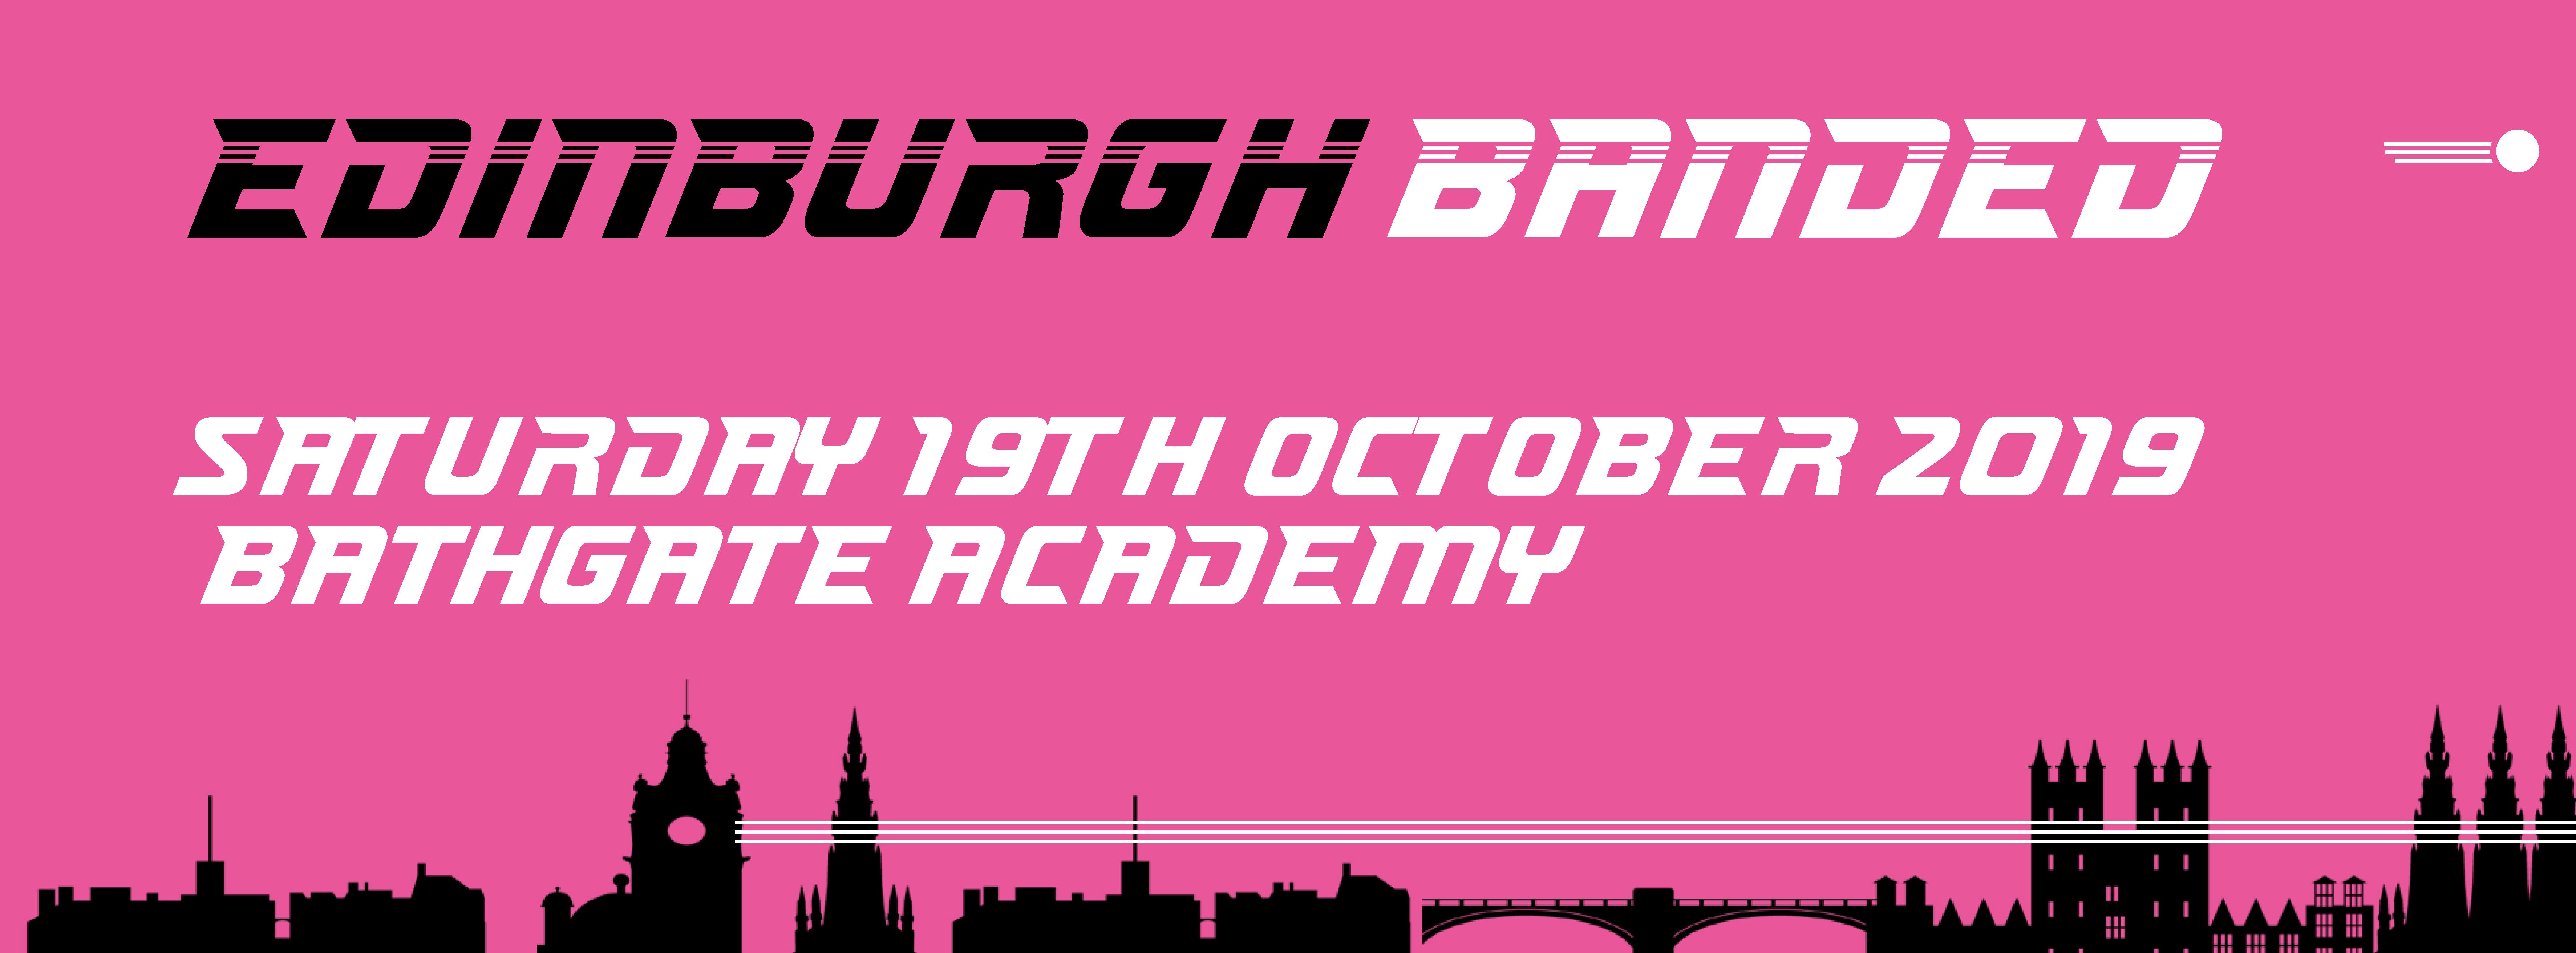 Edinburgh Banded